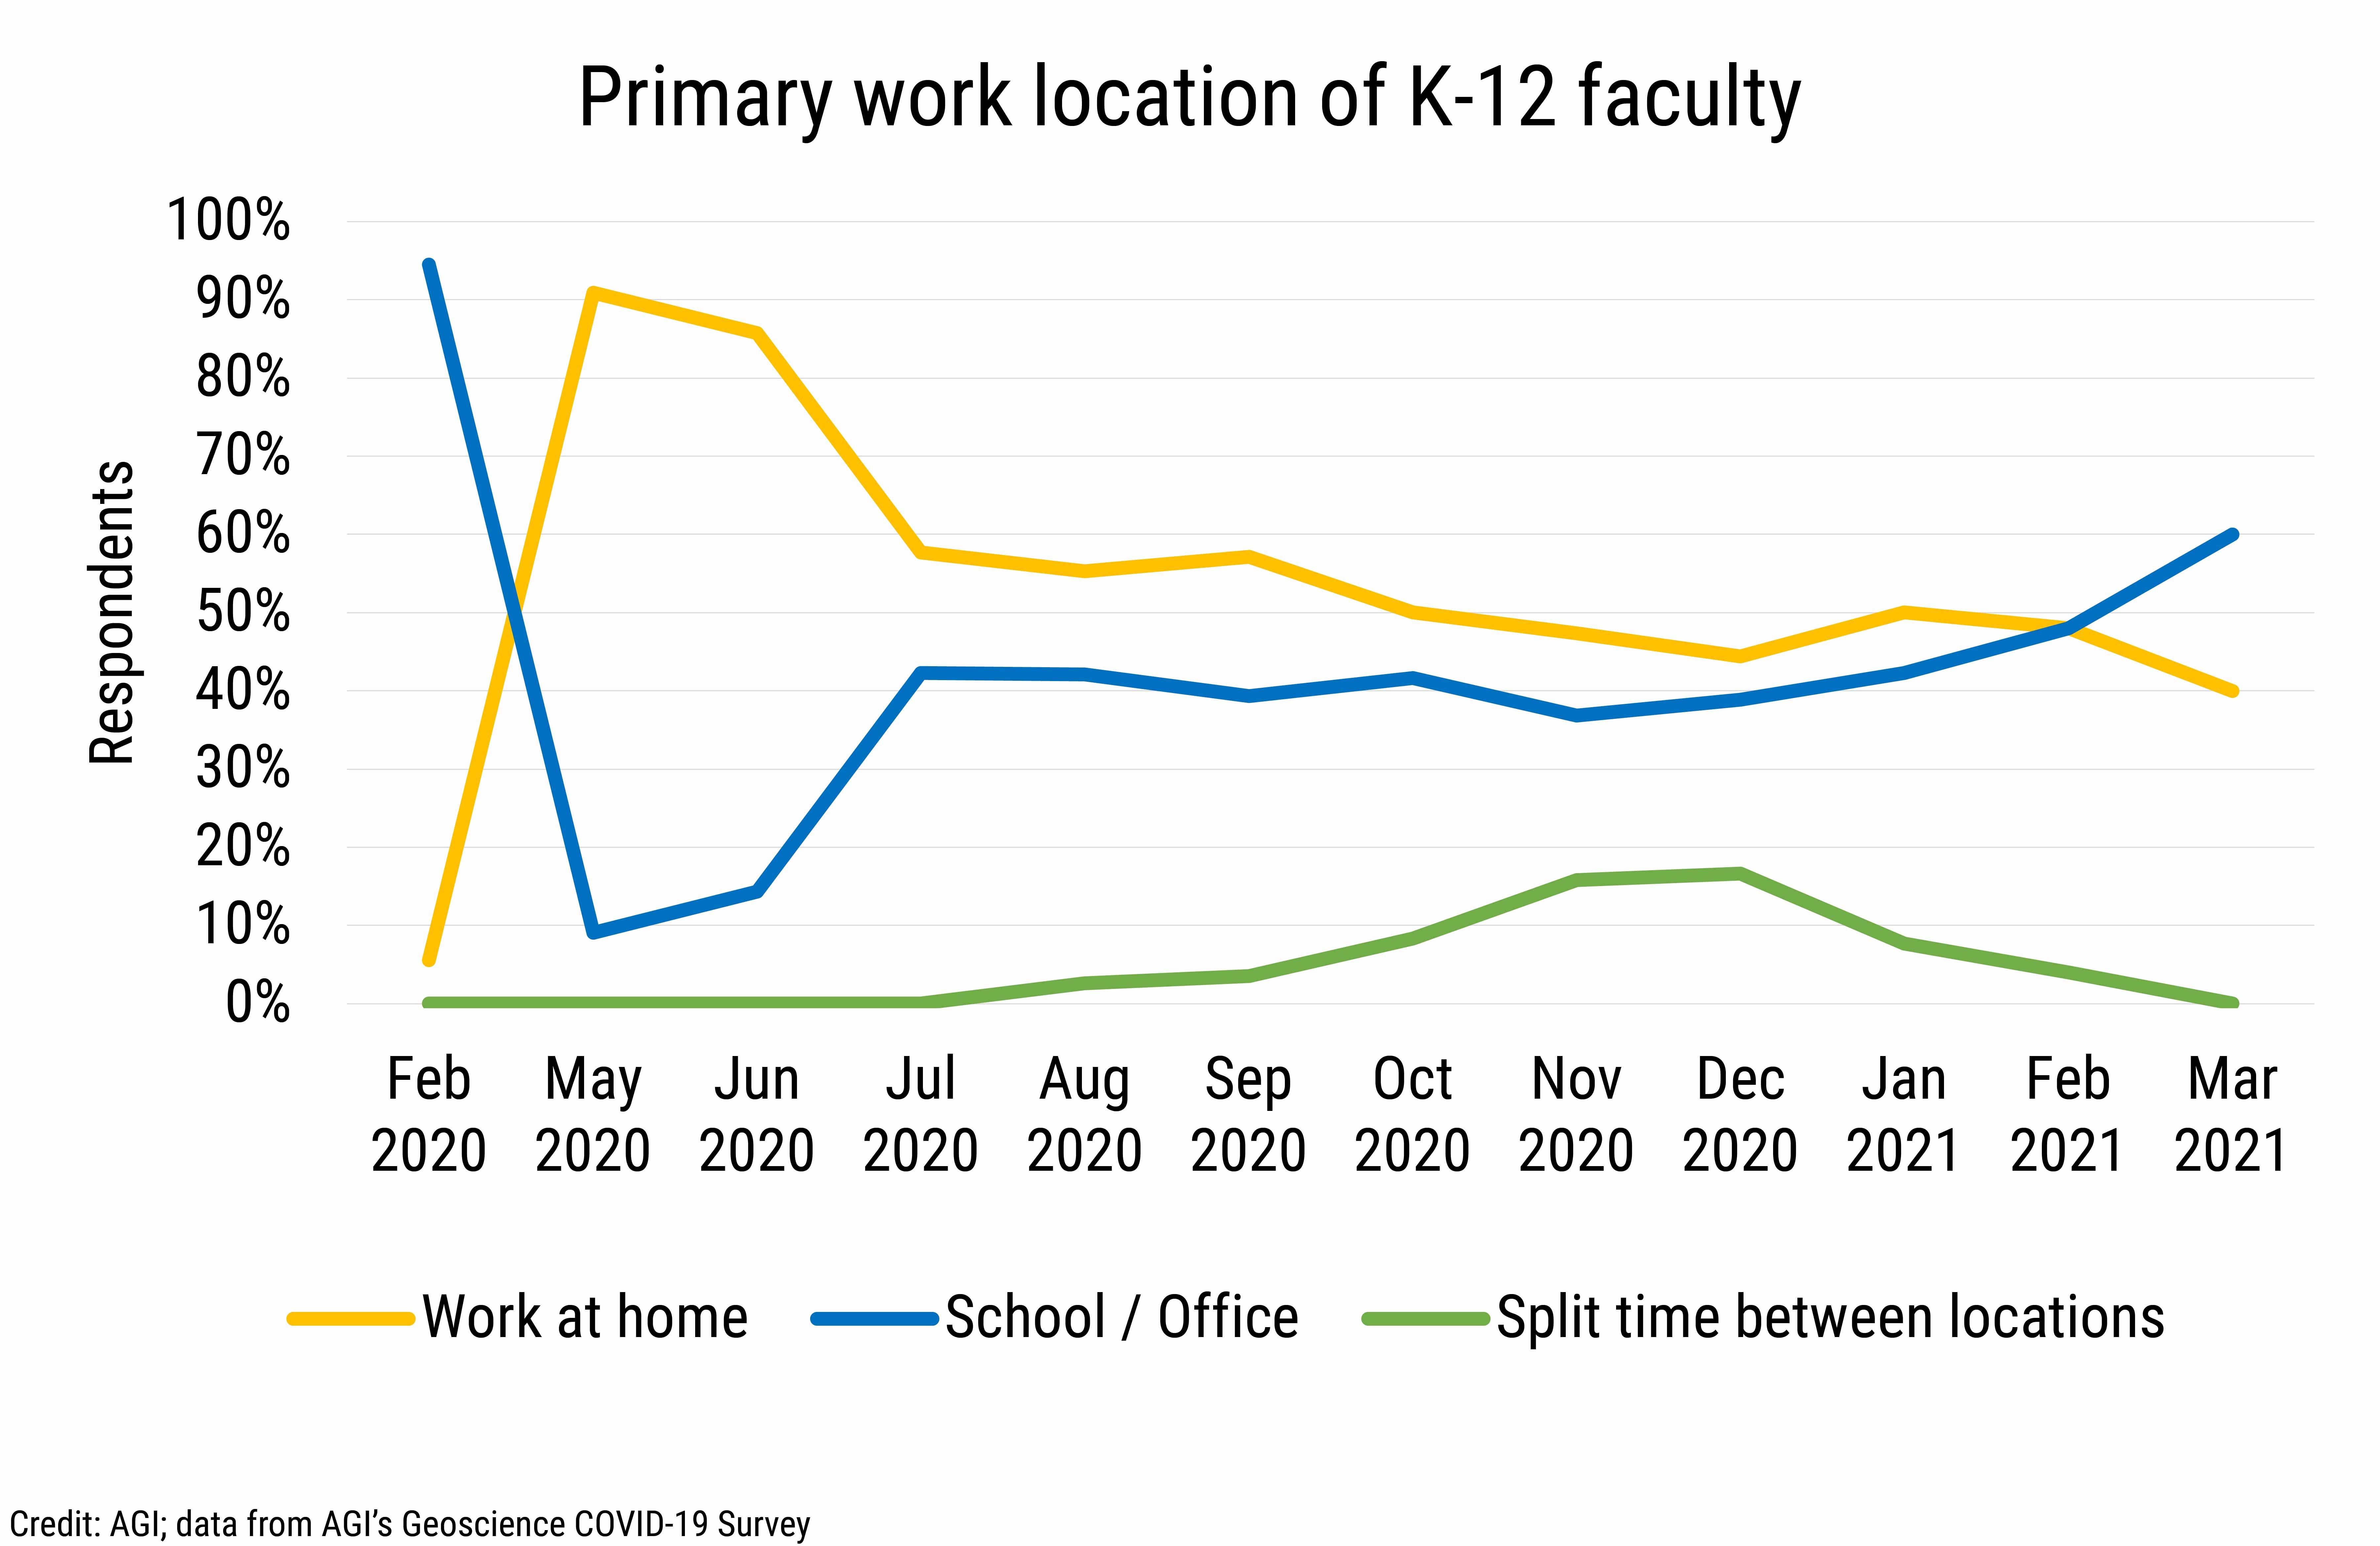 DB_2021-013 chart 01: Primary work location of K-12 faculty (Credit: AGI; data from AGI's Geoscience COVID-19 Survey)